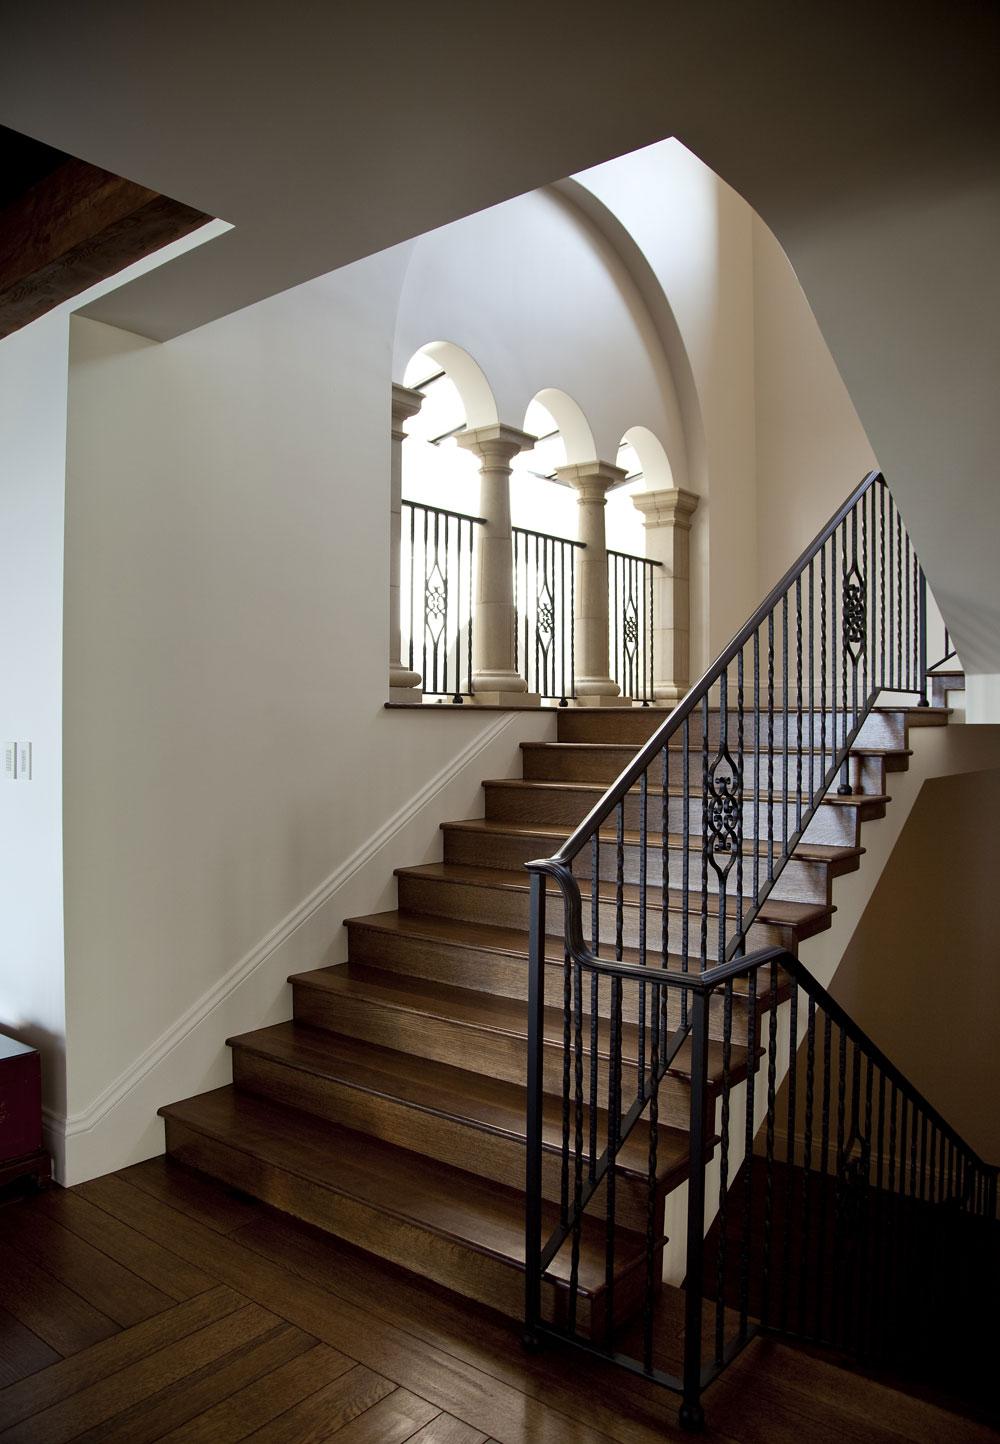 Modern-Spanish-Wood-Floor-Staircase-Wrought-Iron-Railing-Arched-Windows-Corbin-Reeves.jpg